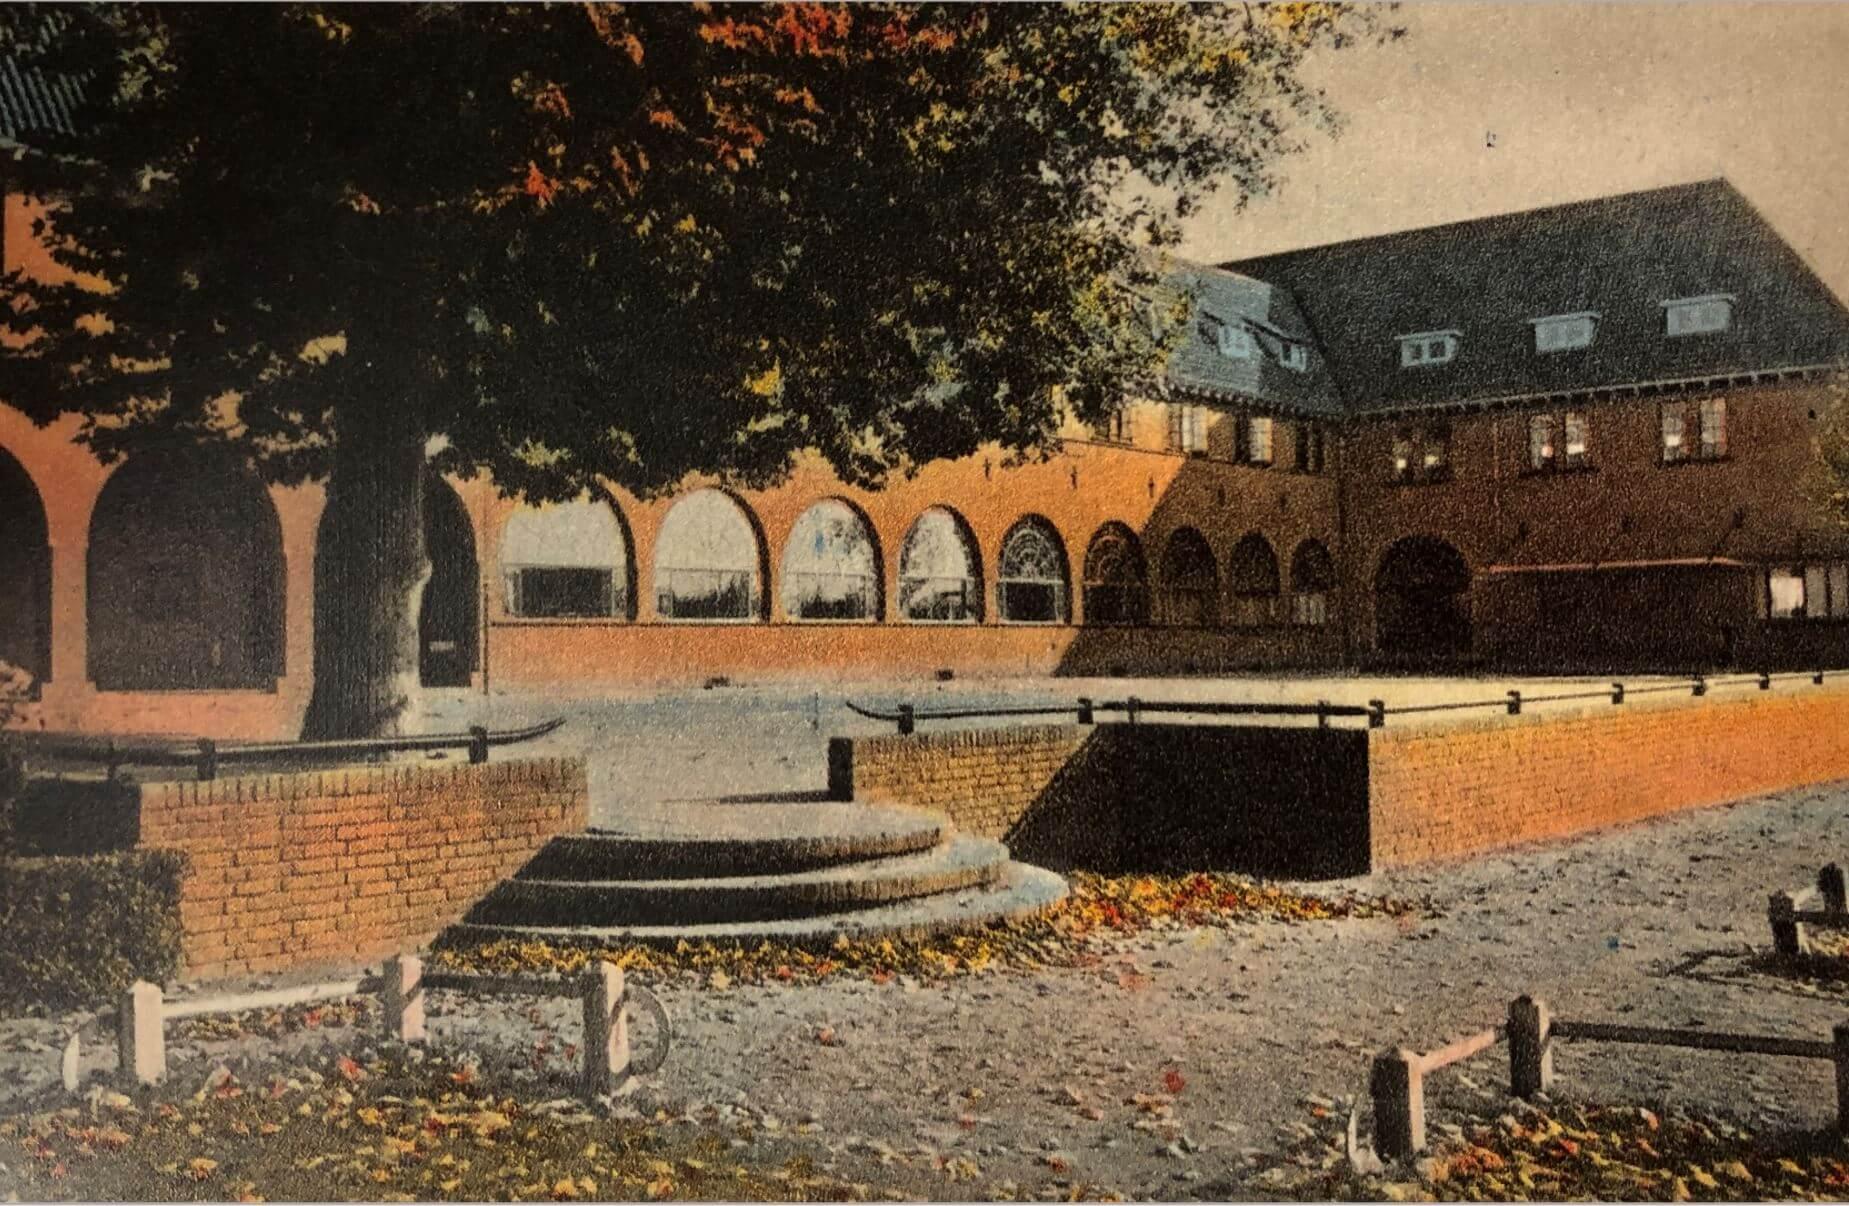 Binnenhof pensionaat